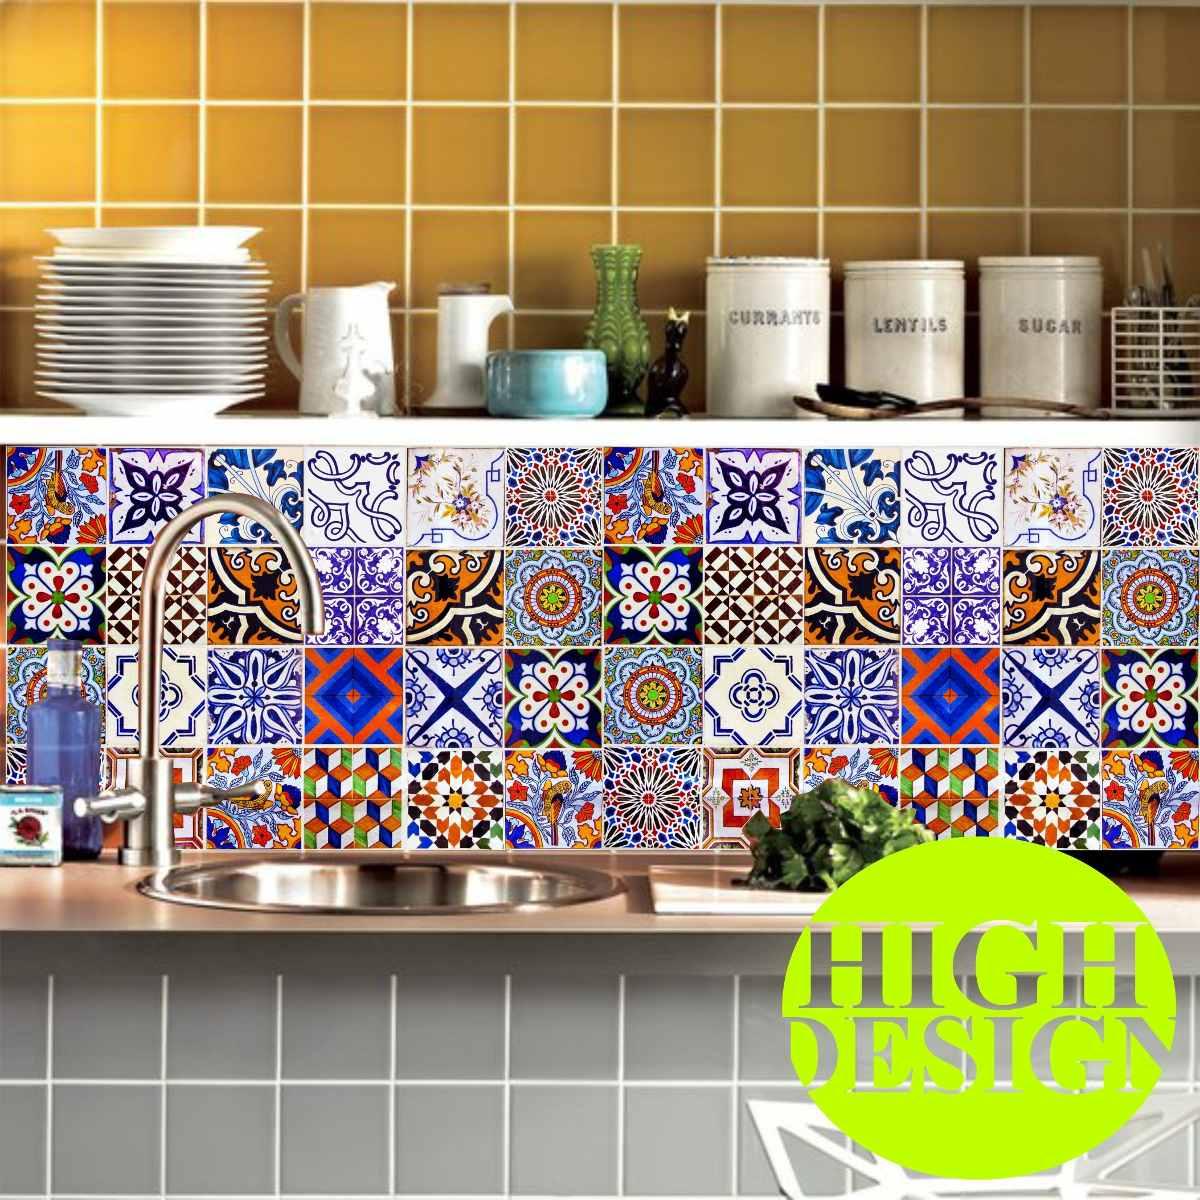 Bobina papel de parede ladrilho hidr ulico azulejo for Papel adhesivo para azulejos